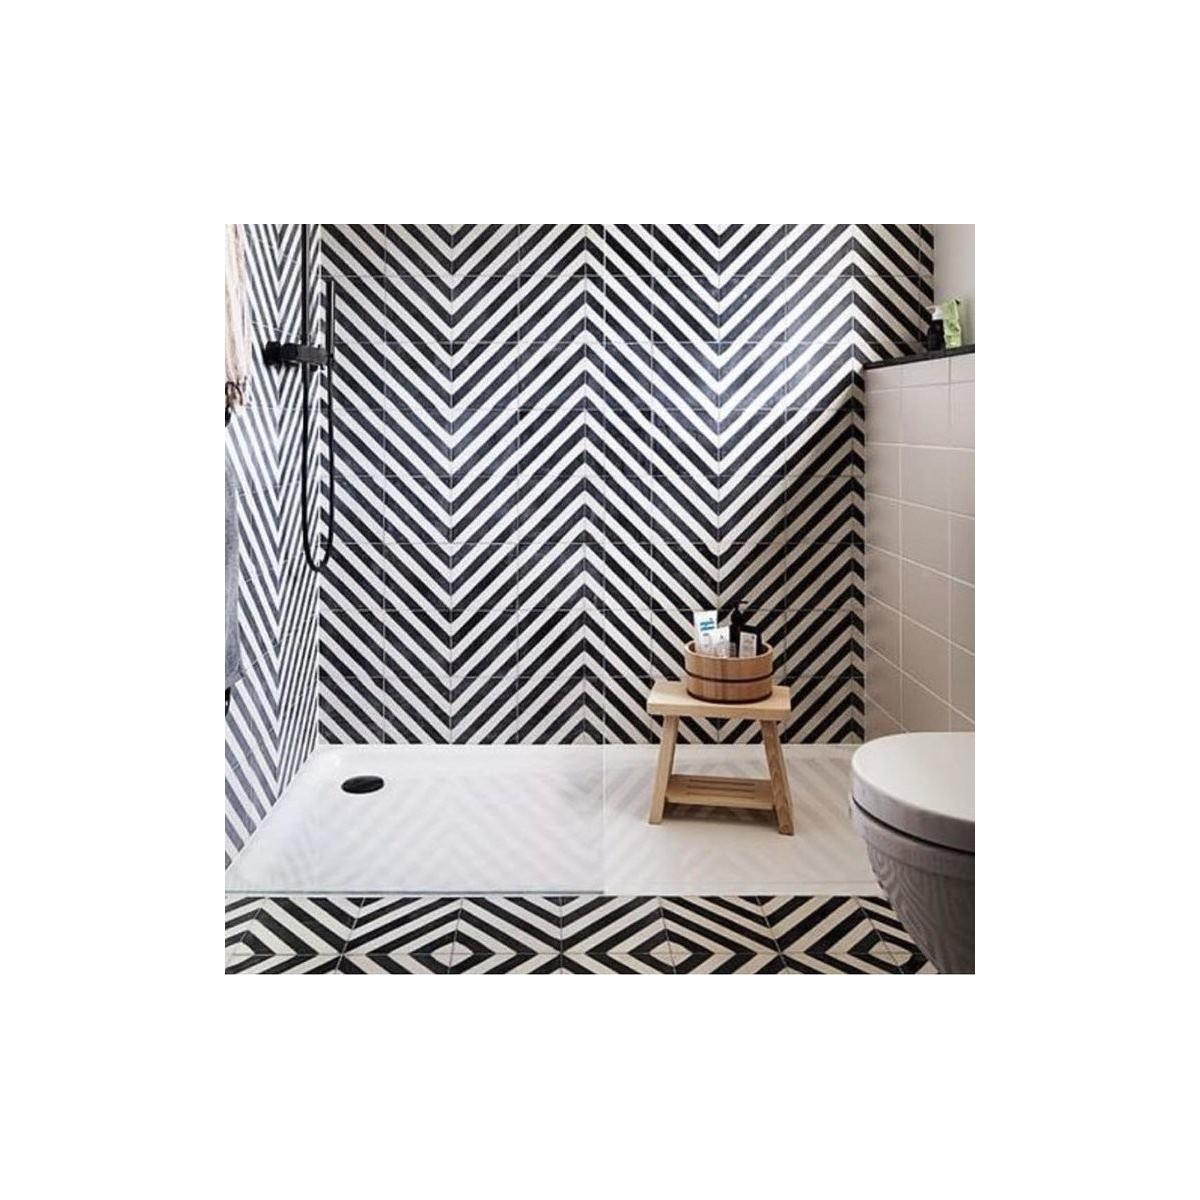 Goroka Grafito (m2) - Pavimento hidráulico Porcelánico para interior y exterior - Serie Maori